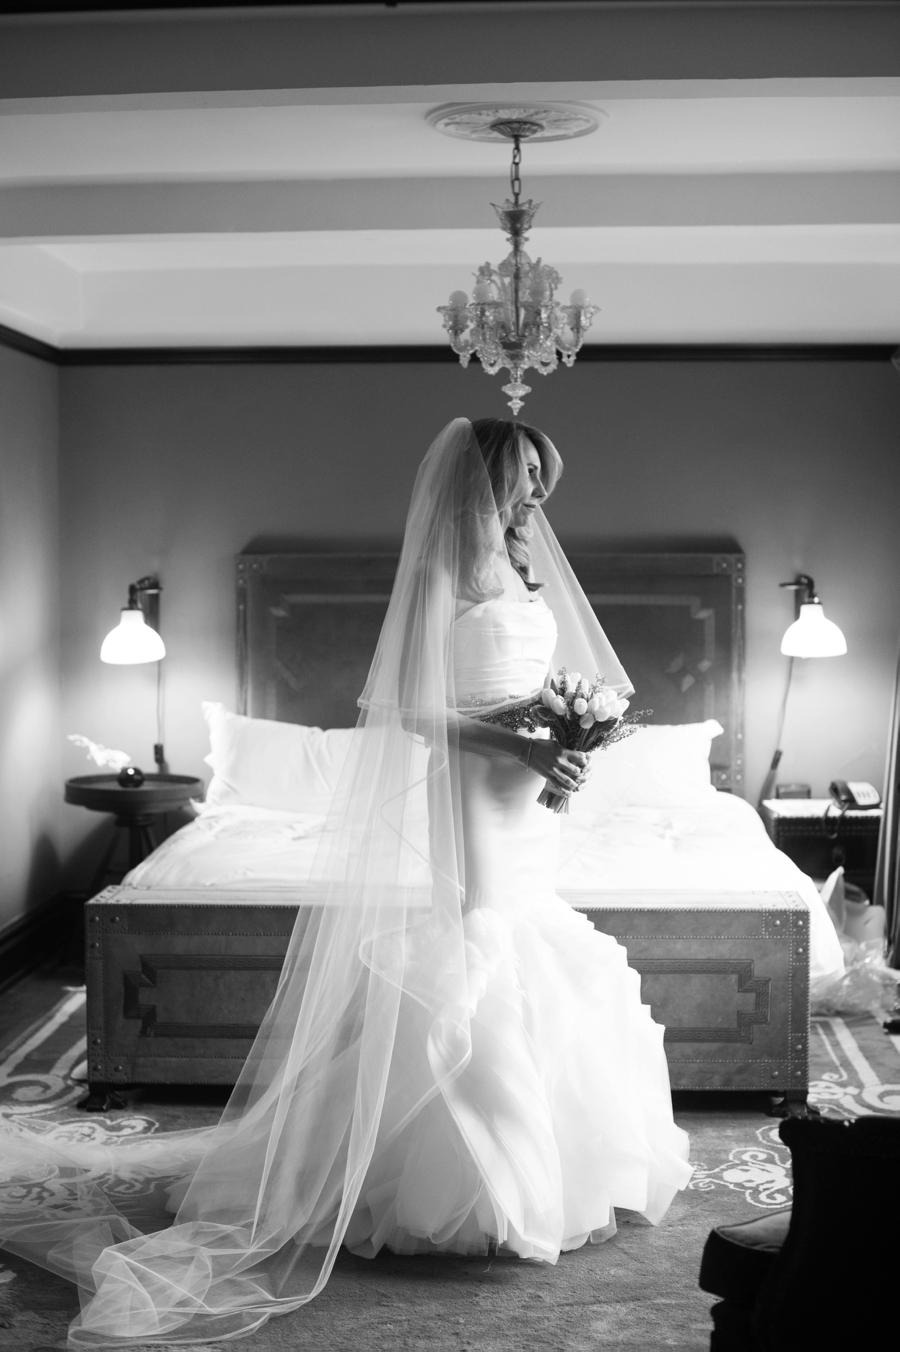 Gramercy_Park_Hotel_NYC_Wedding_MC_0014.jpg